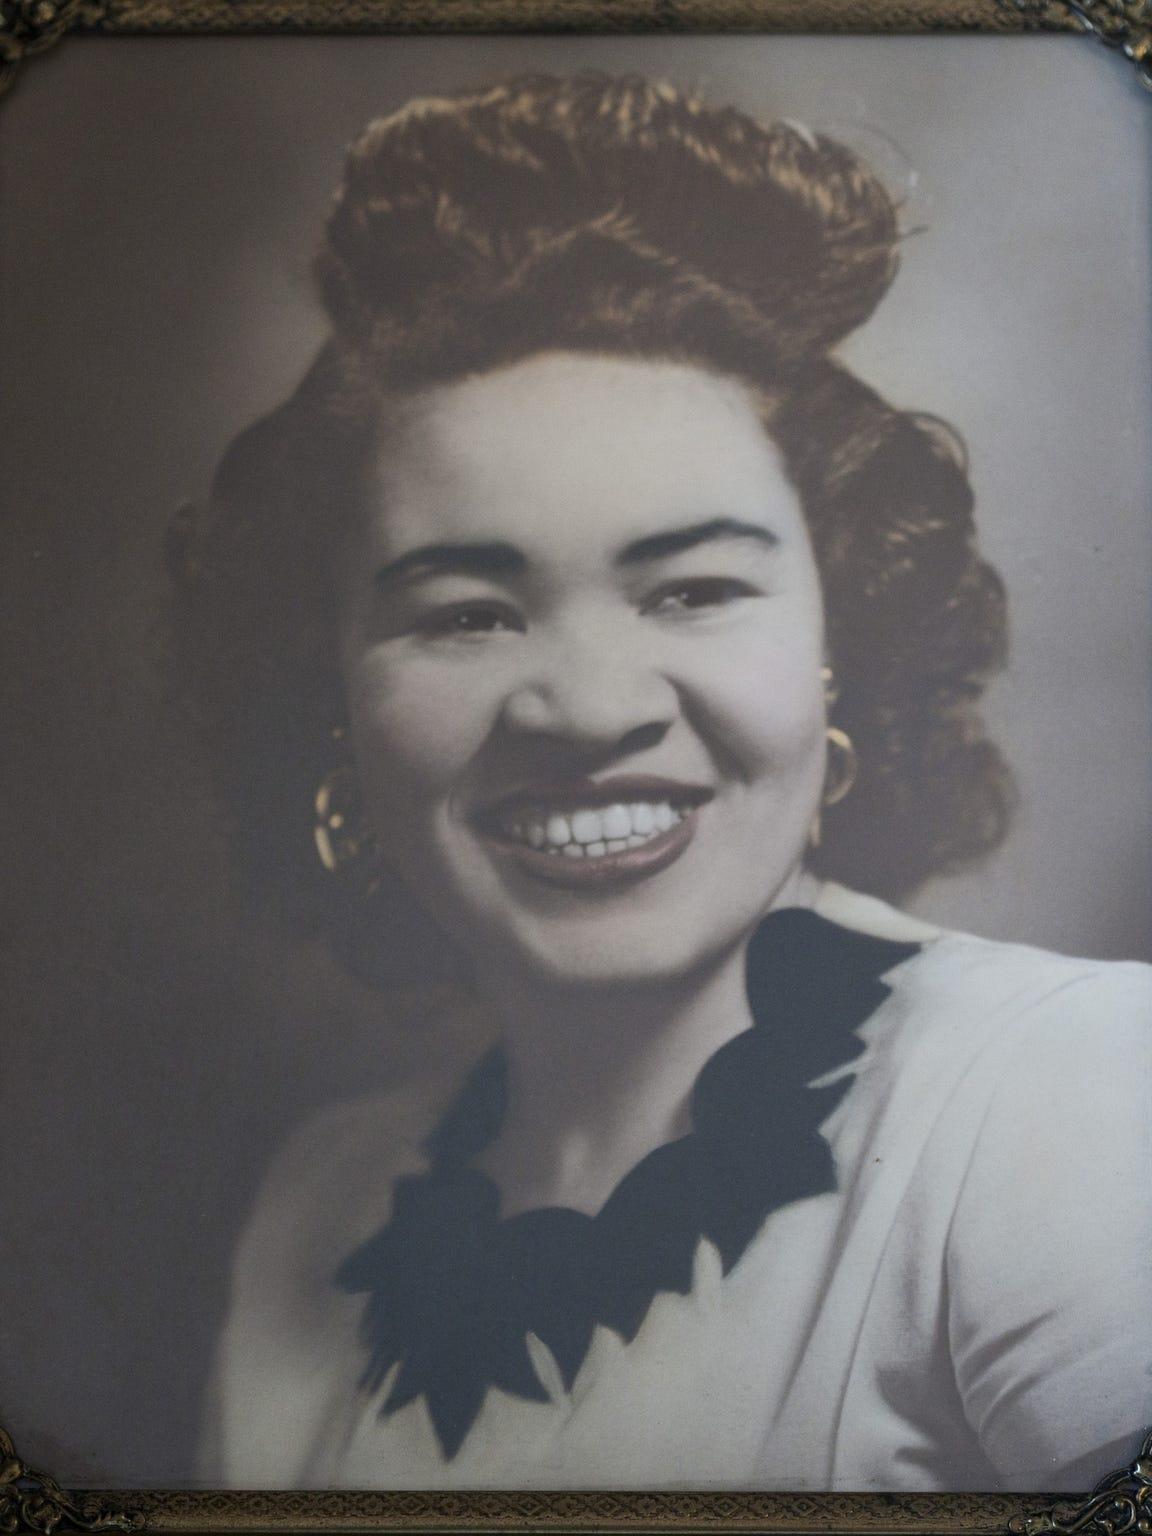 Mary Jean Price Walls' high school graduation photo.